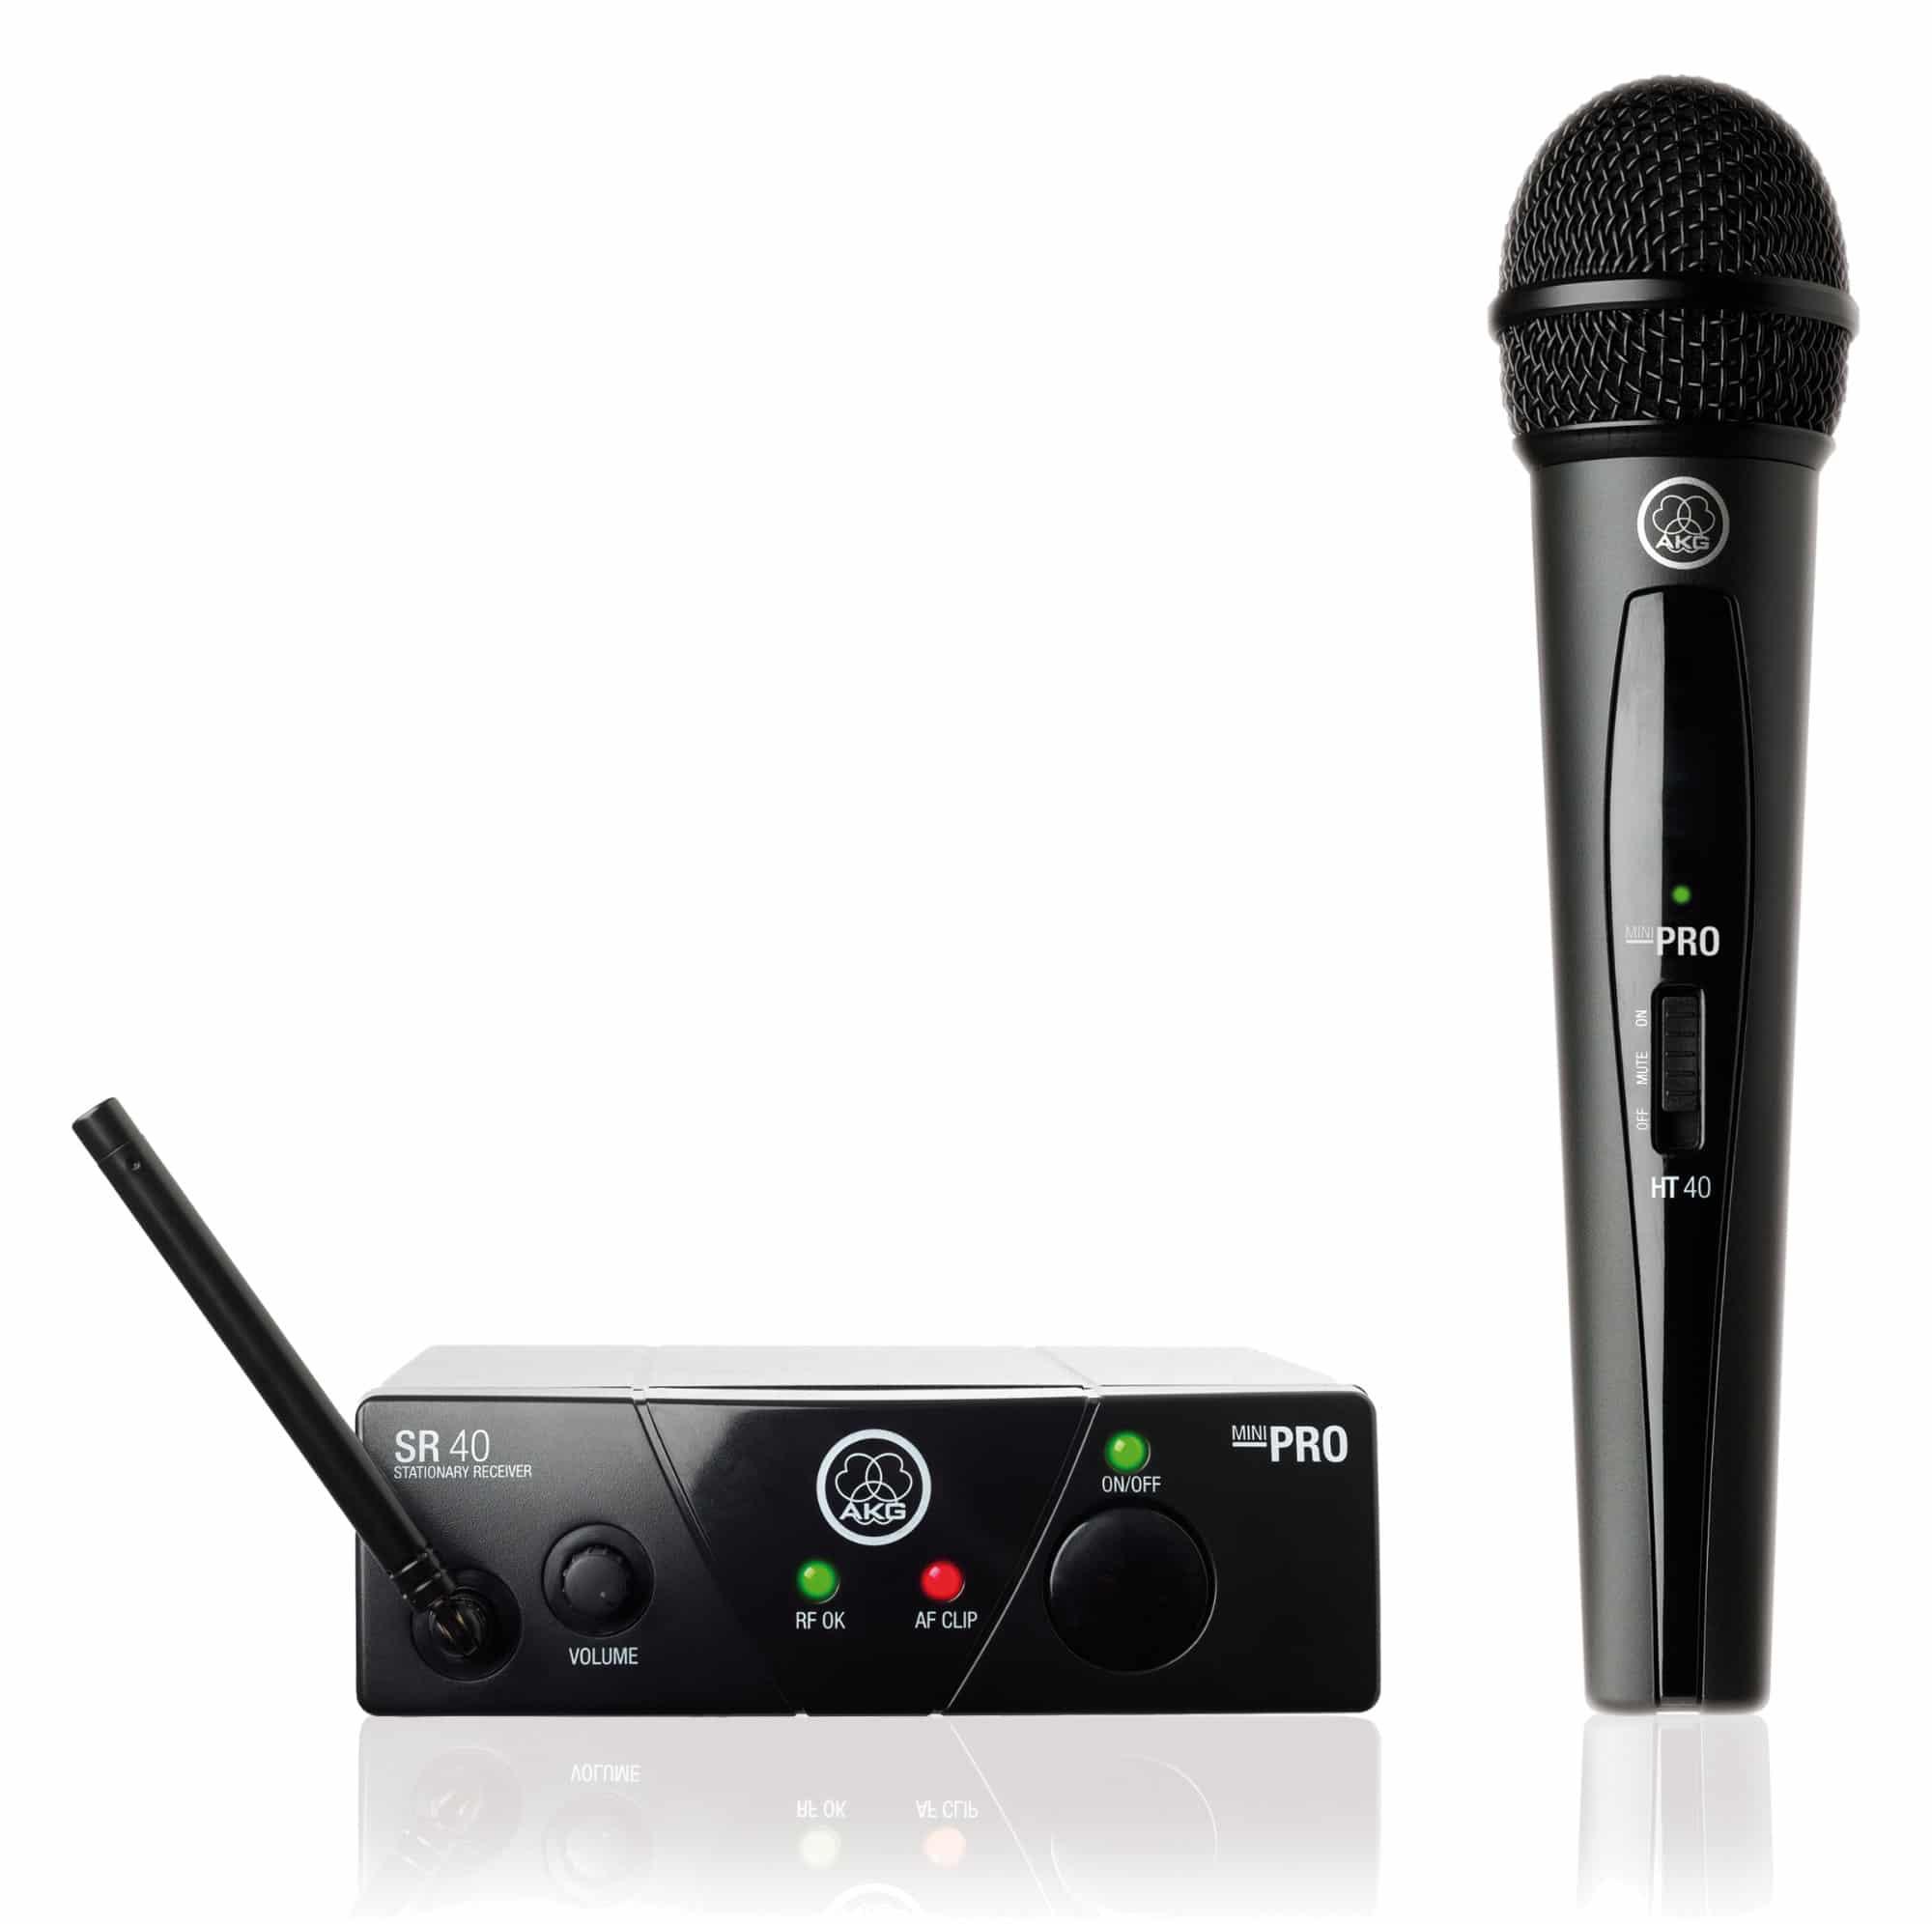 AKG WMS 40 Mini Vocal Handfunkmikrofon Set ISM1 863,100 MHz